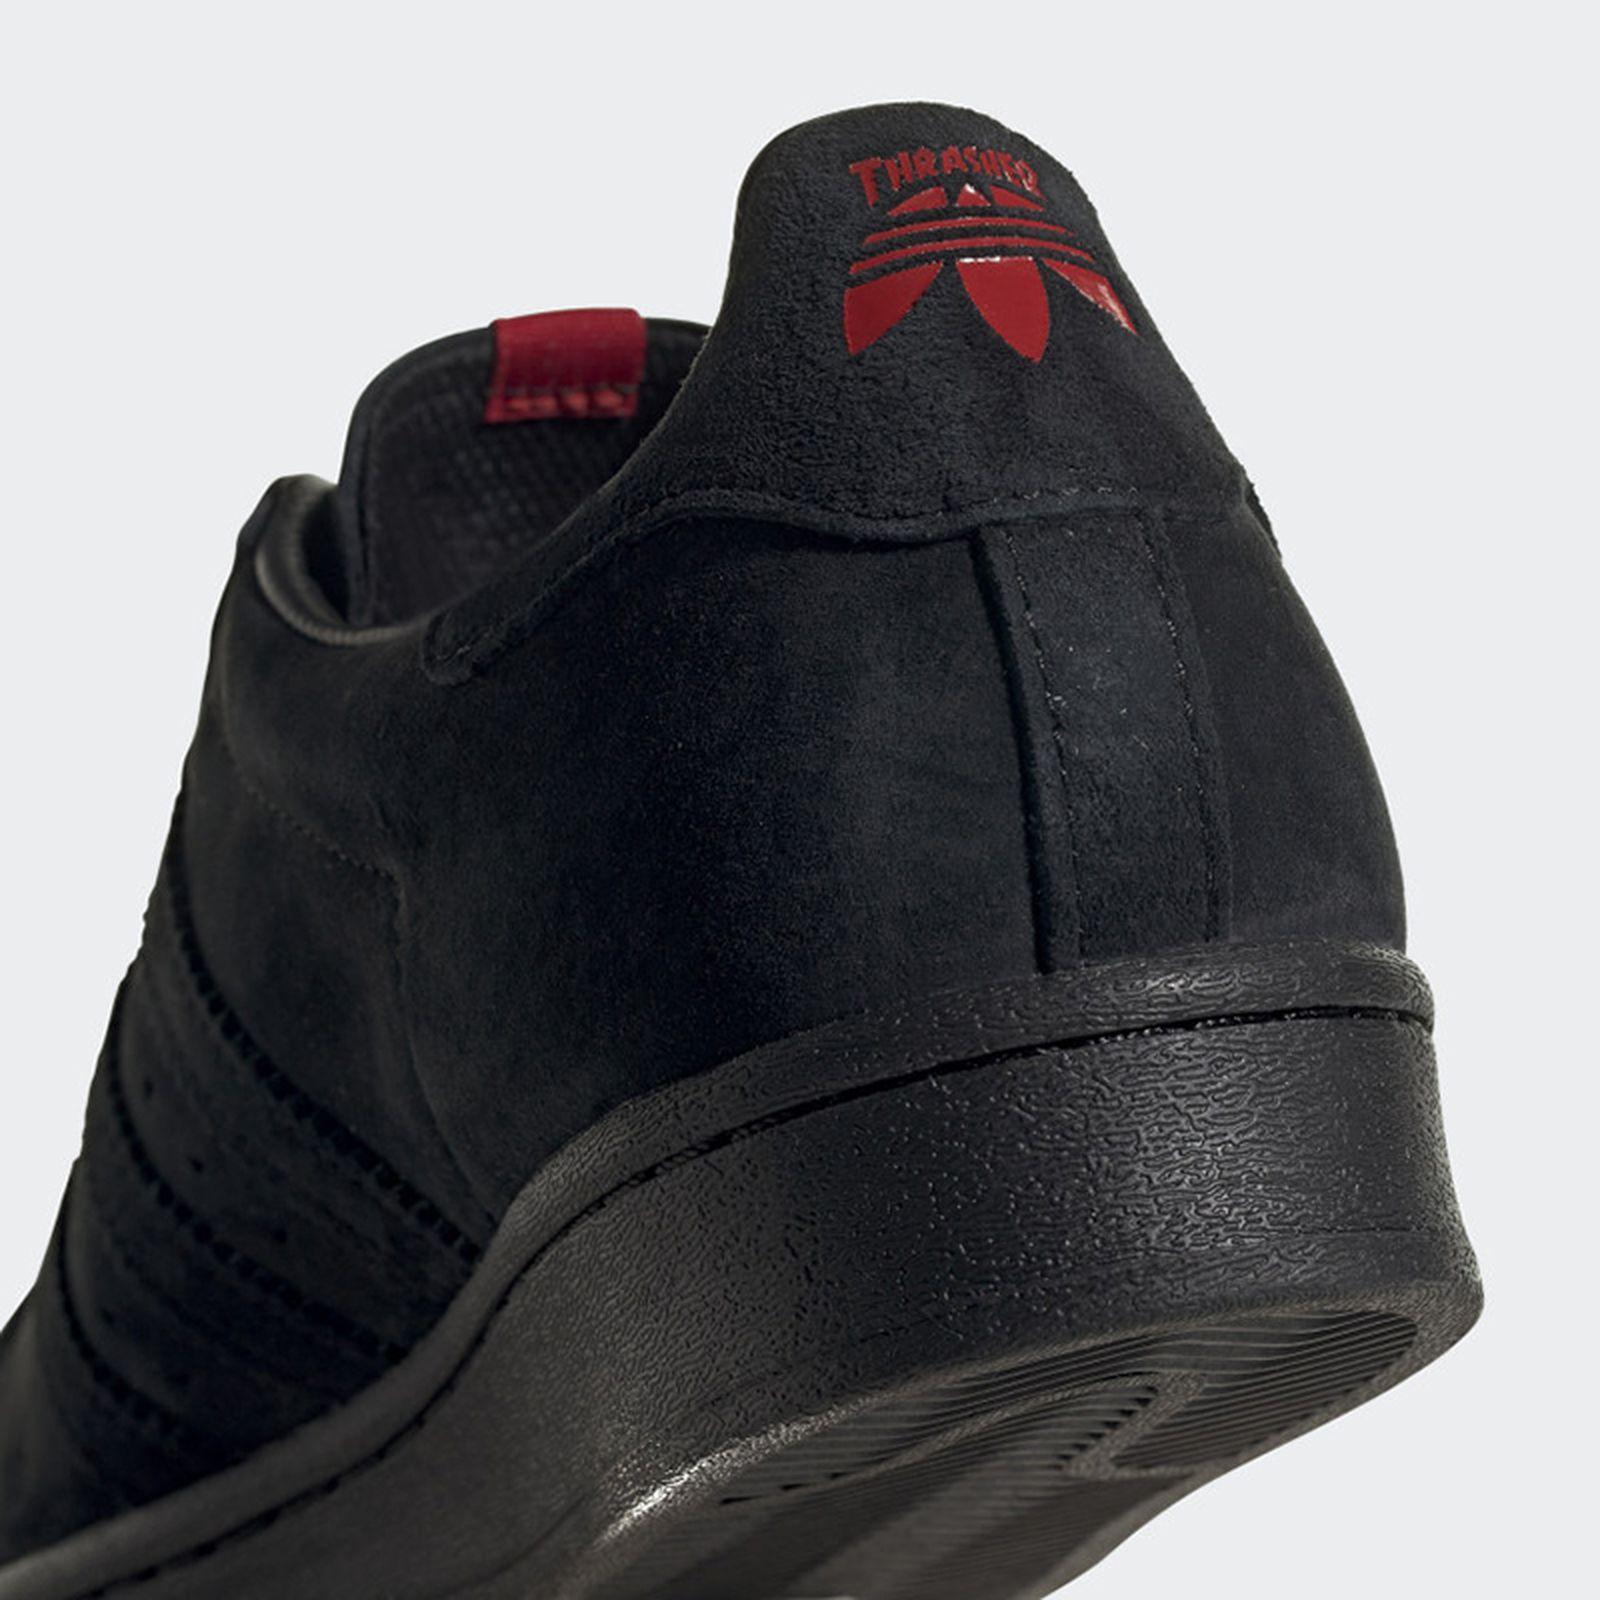 thrasher-adidas-superstar-adv-tyshawn-jones-release-date-price-1-07